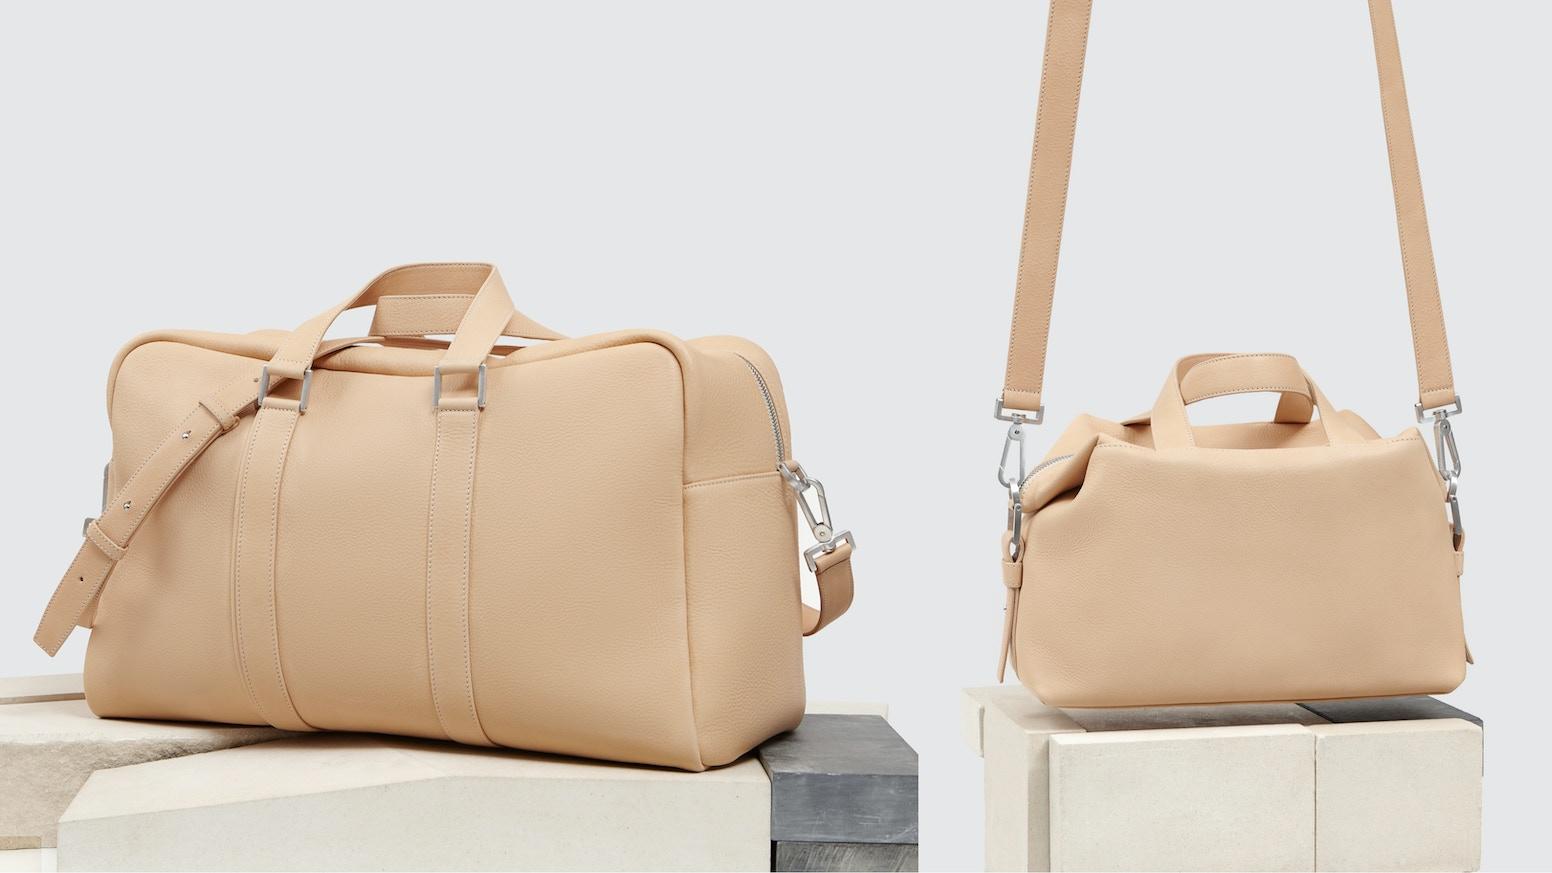 762fac6fb638 Silent goods  Luxury craft. Zero branding. Twice the value. by ...